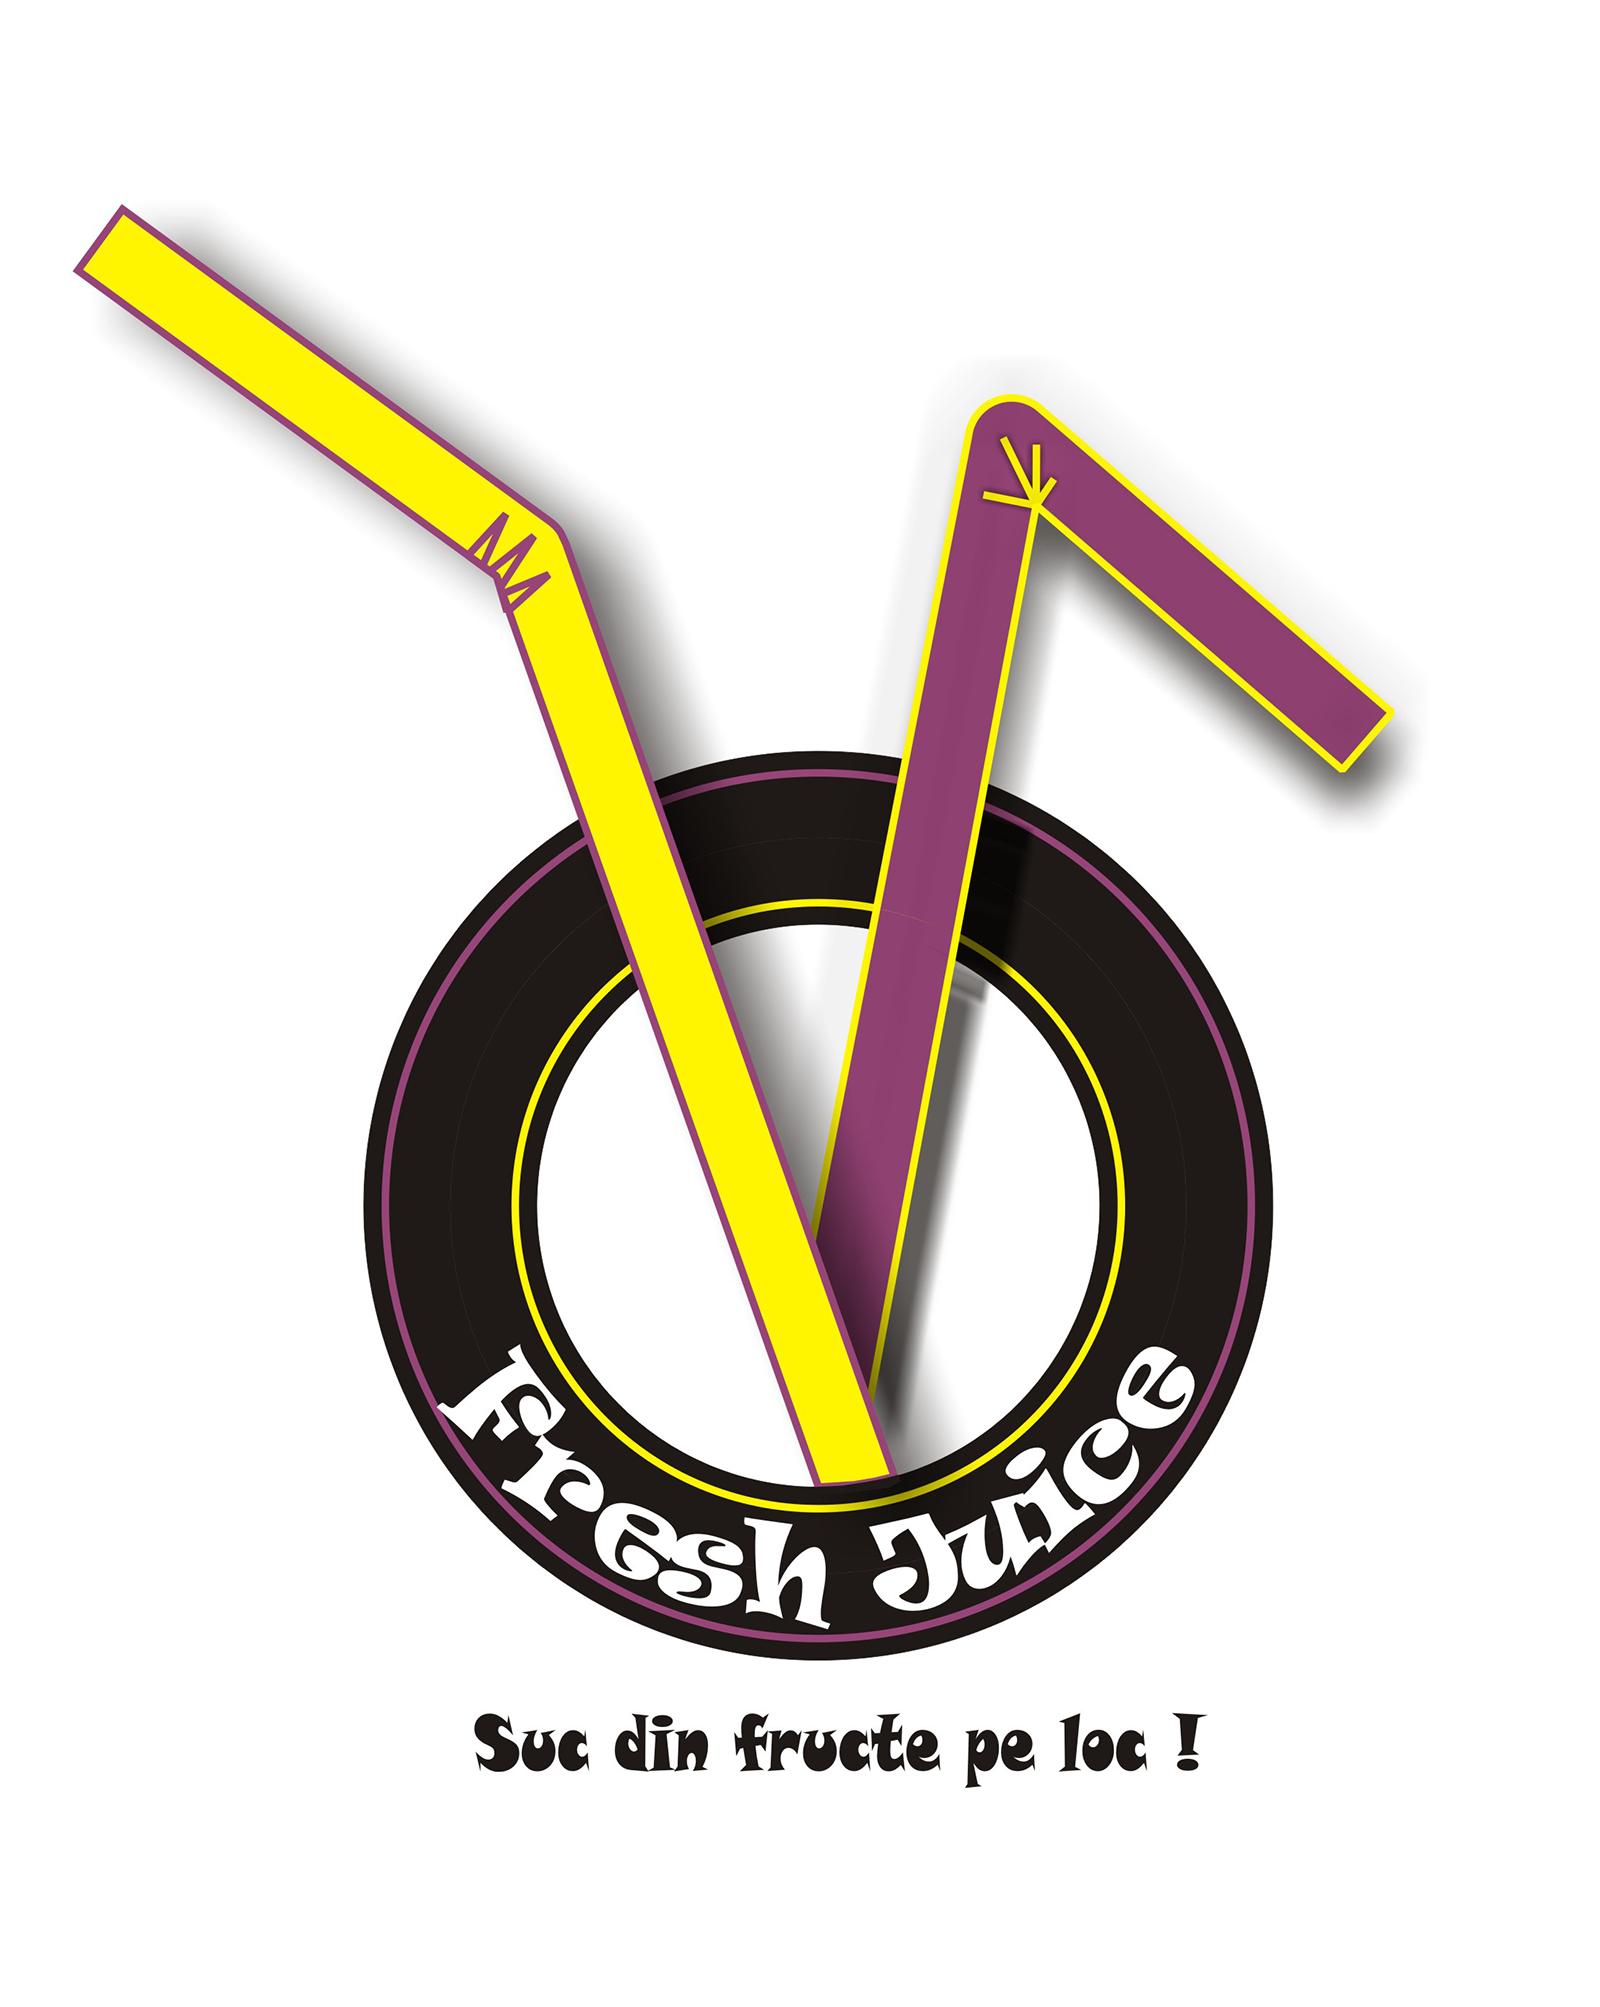 Logo suc